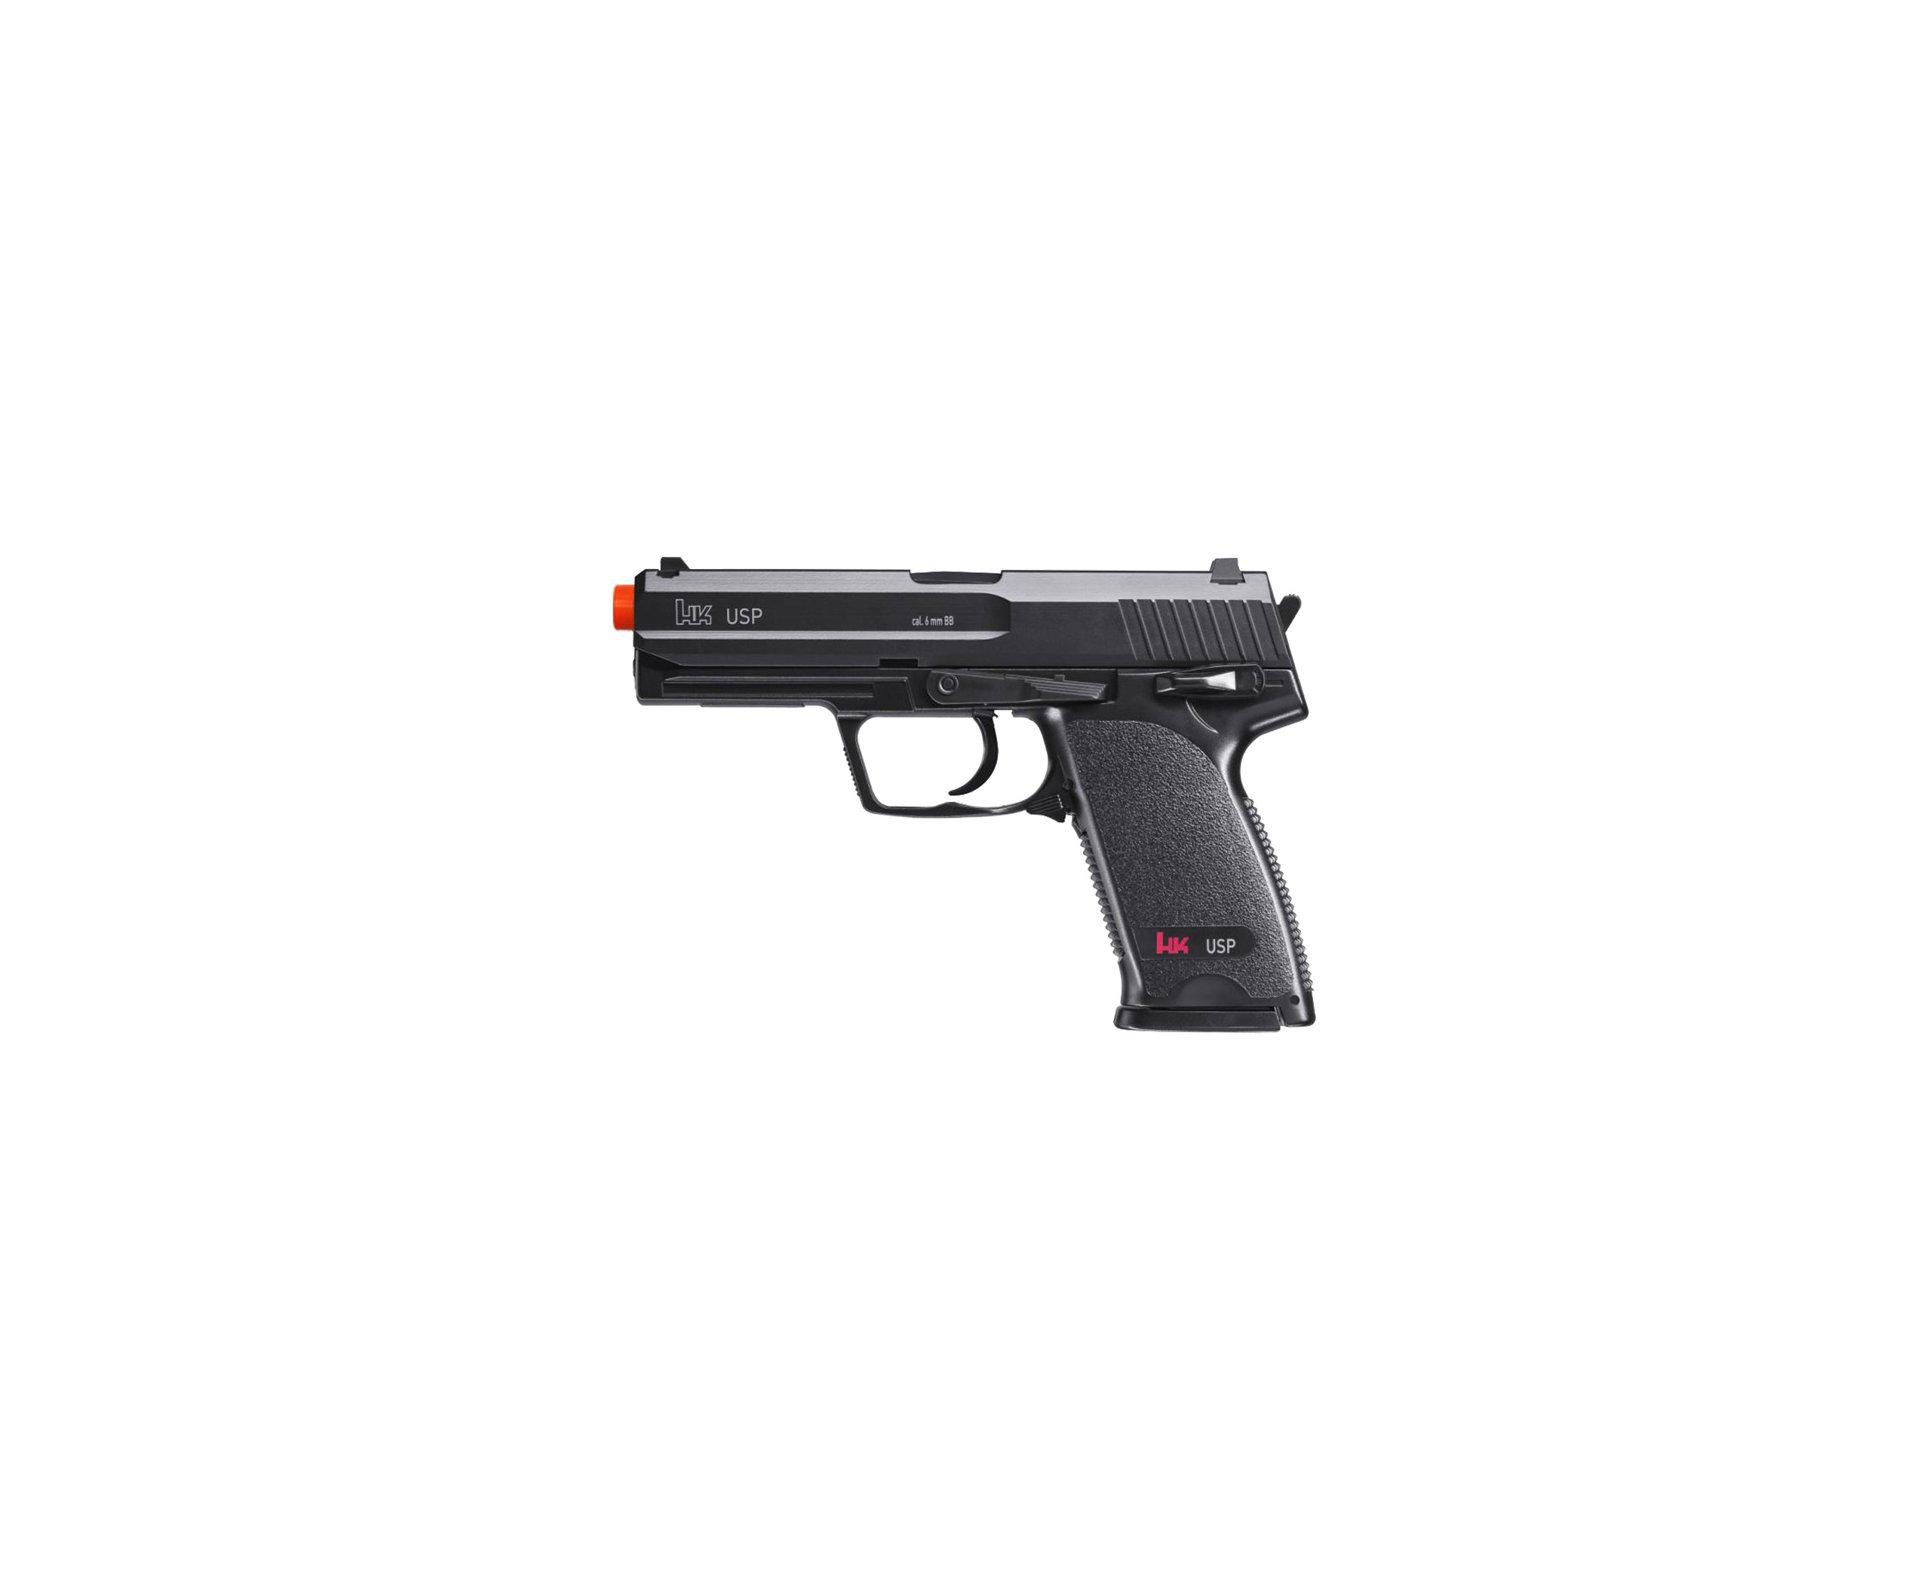 Pistola De Airsoft Hk Usp - Calibre 6,0 Mm - Abs